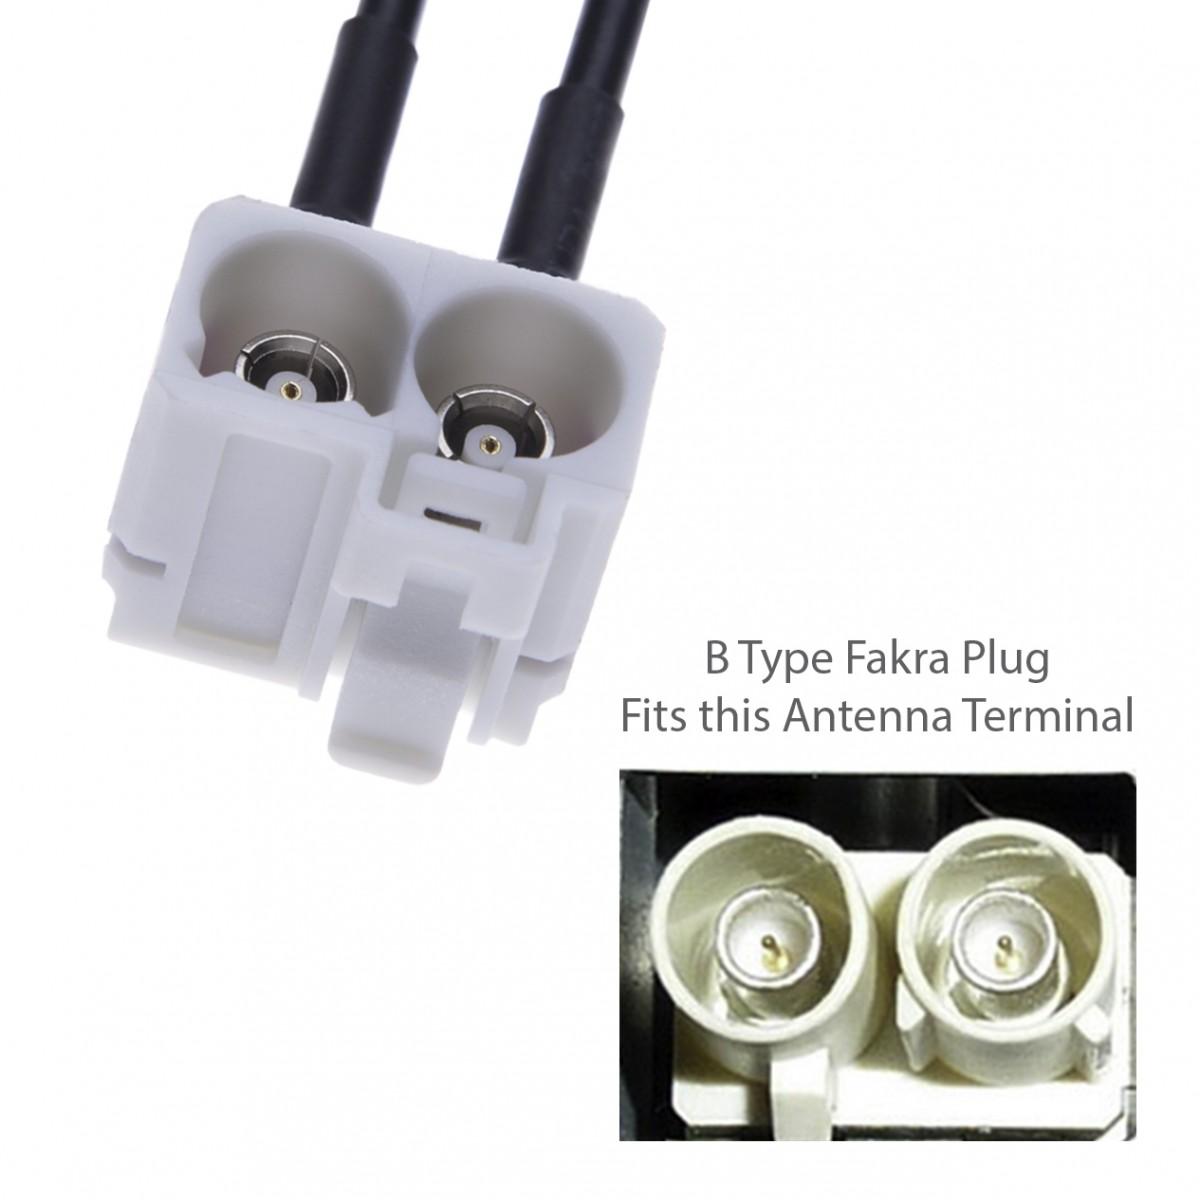 Dual Fakra Car Antenna Adapter for 3rd Generation Radios in VW Volkswagen  Golf 5 / 6 / Passat / EOS / Jetta / Touareg RCD, RNS310, RNS, MFD Radio